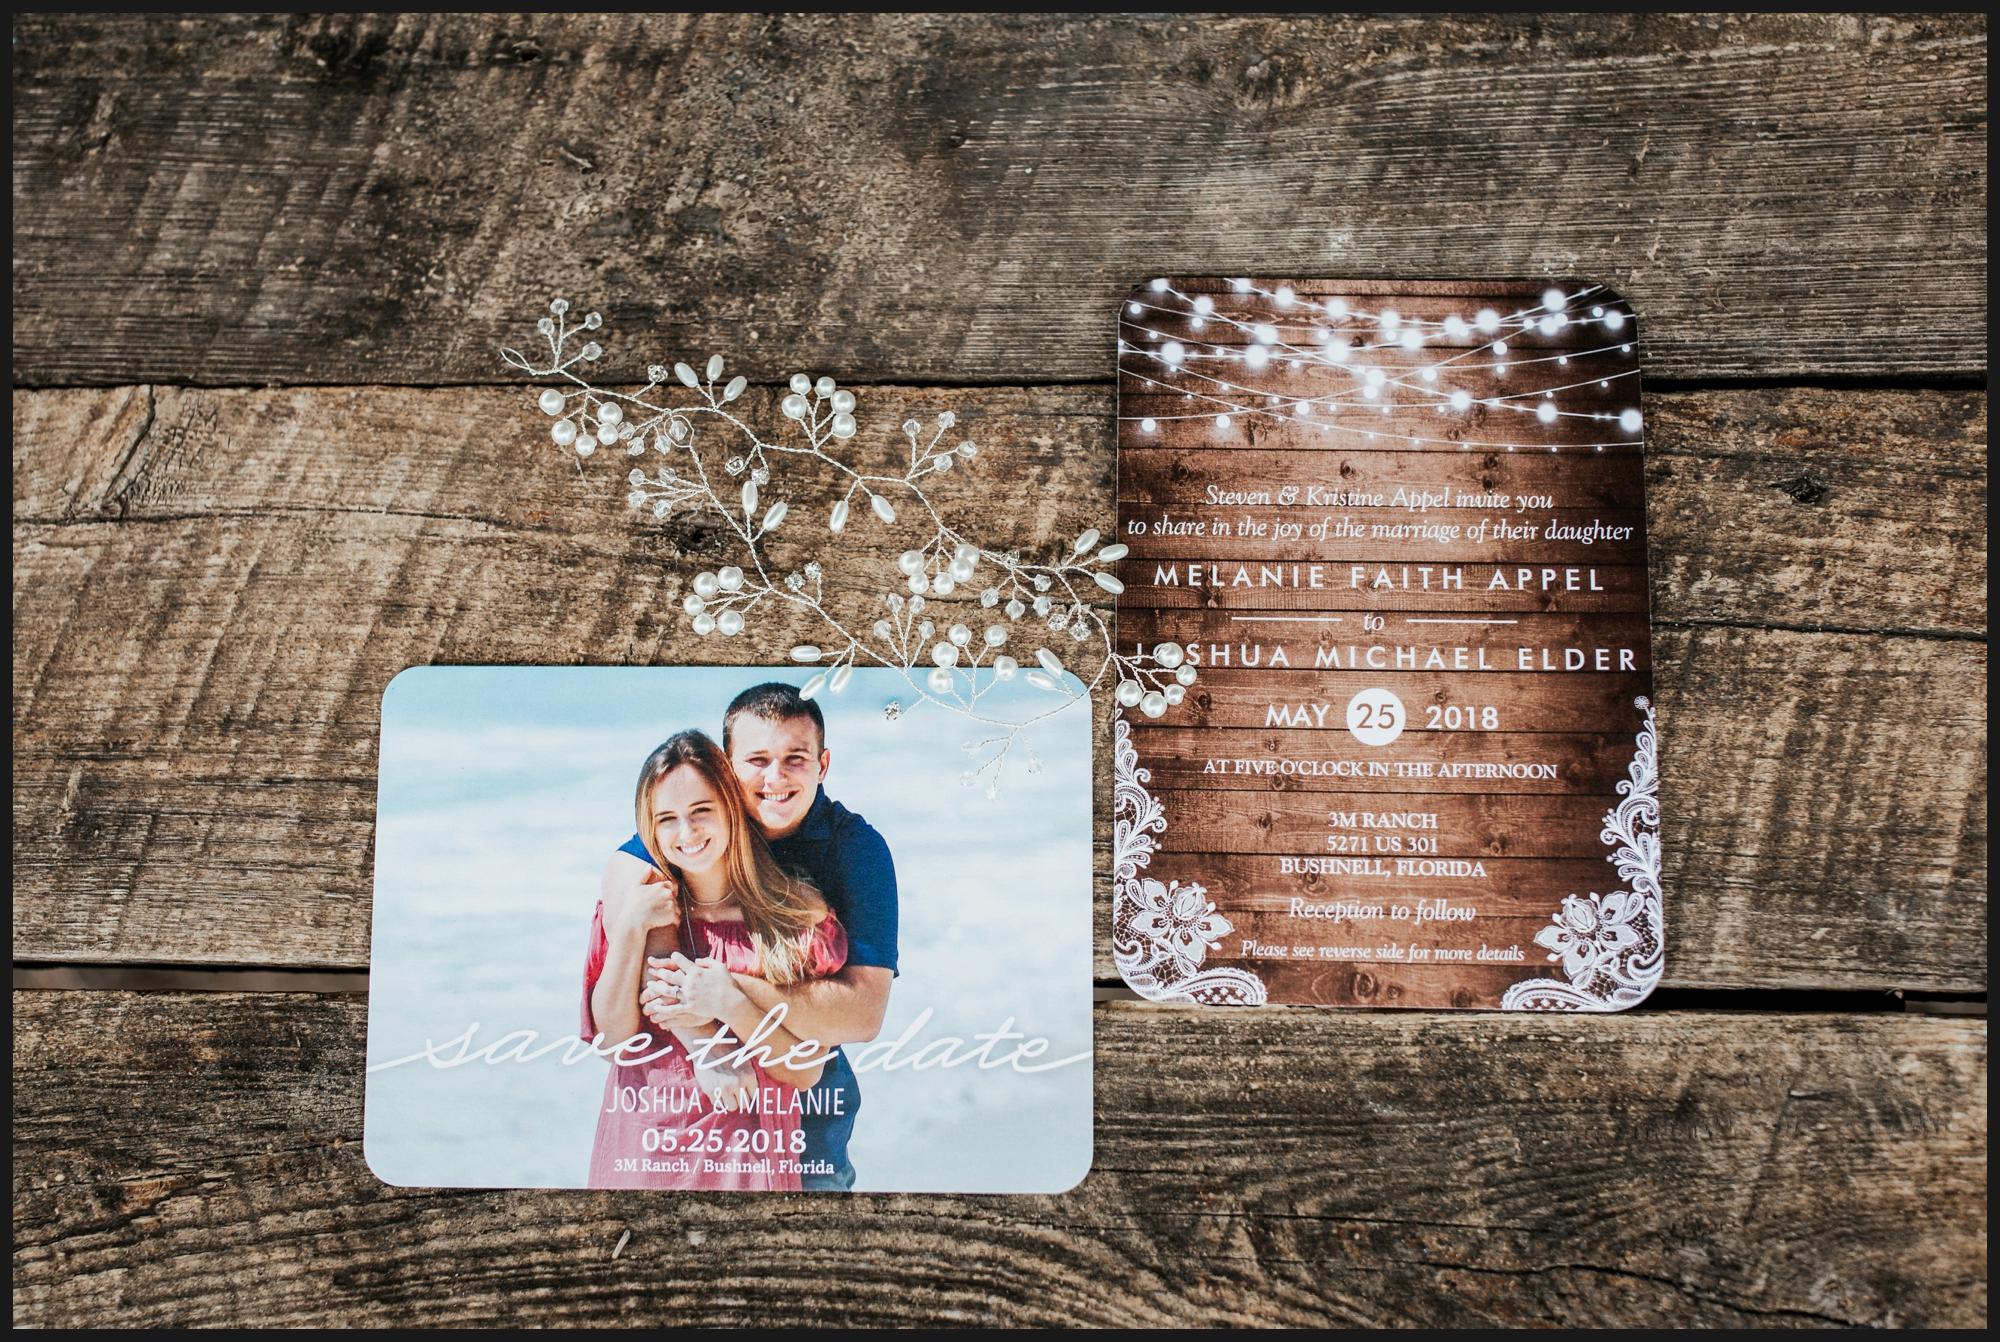 Orlando-Wedding-Photographer-destination-wedding-photographer-florida-wedding-photographer-hawaii-wedding-photographer_0271.jpg